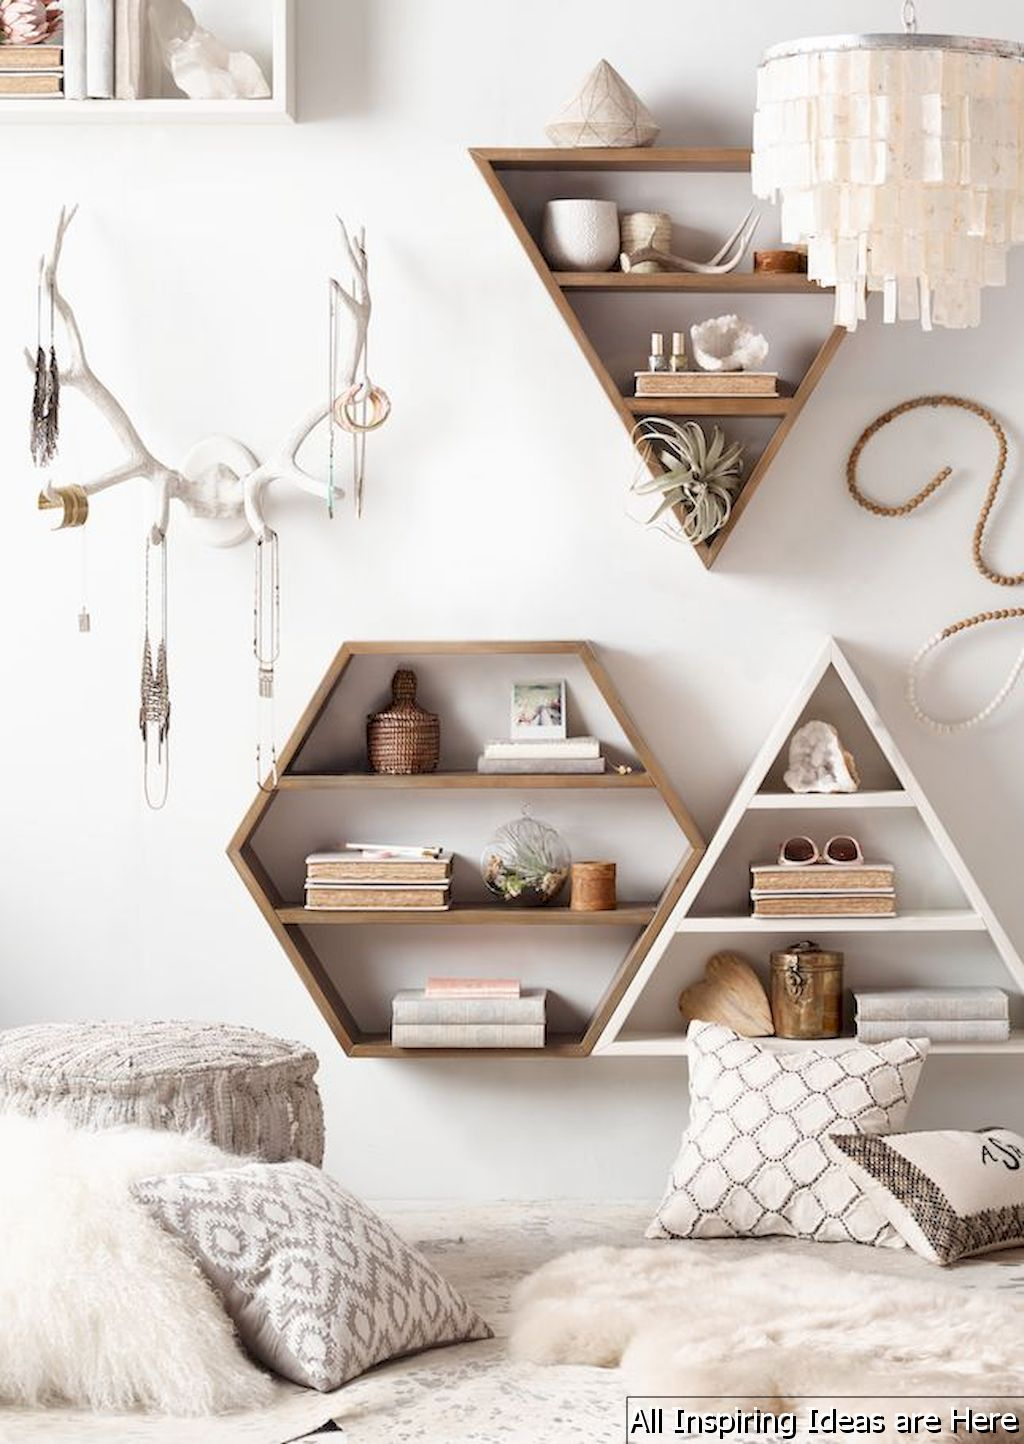 Amazing Gorgeous 65 Simple Bedroom Shelves Design Ideas Https://roomaholic.com/1036